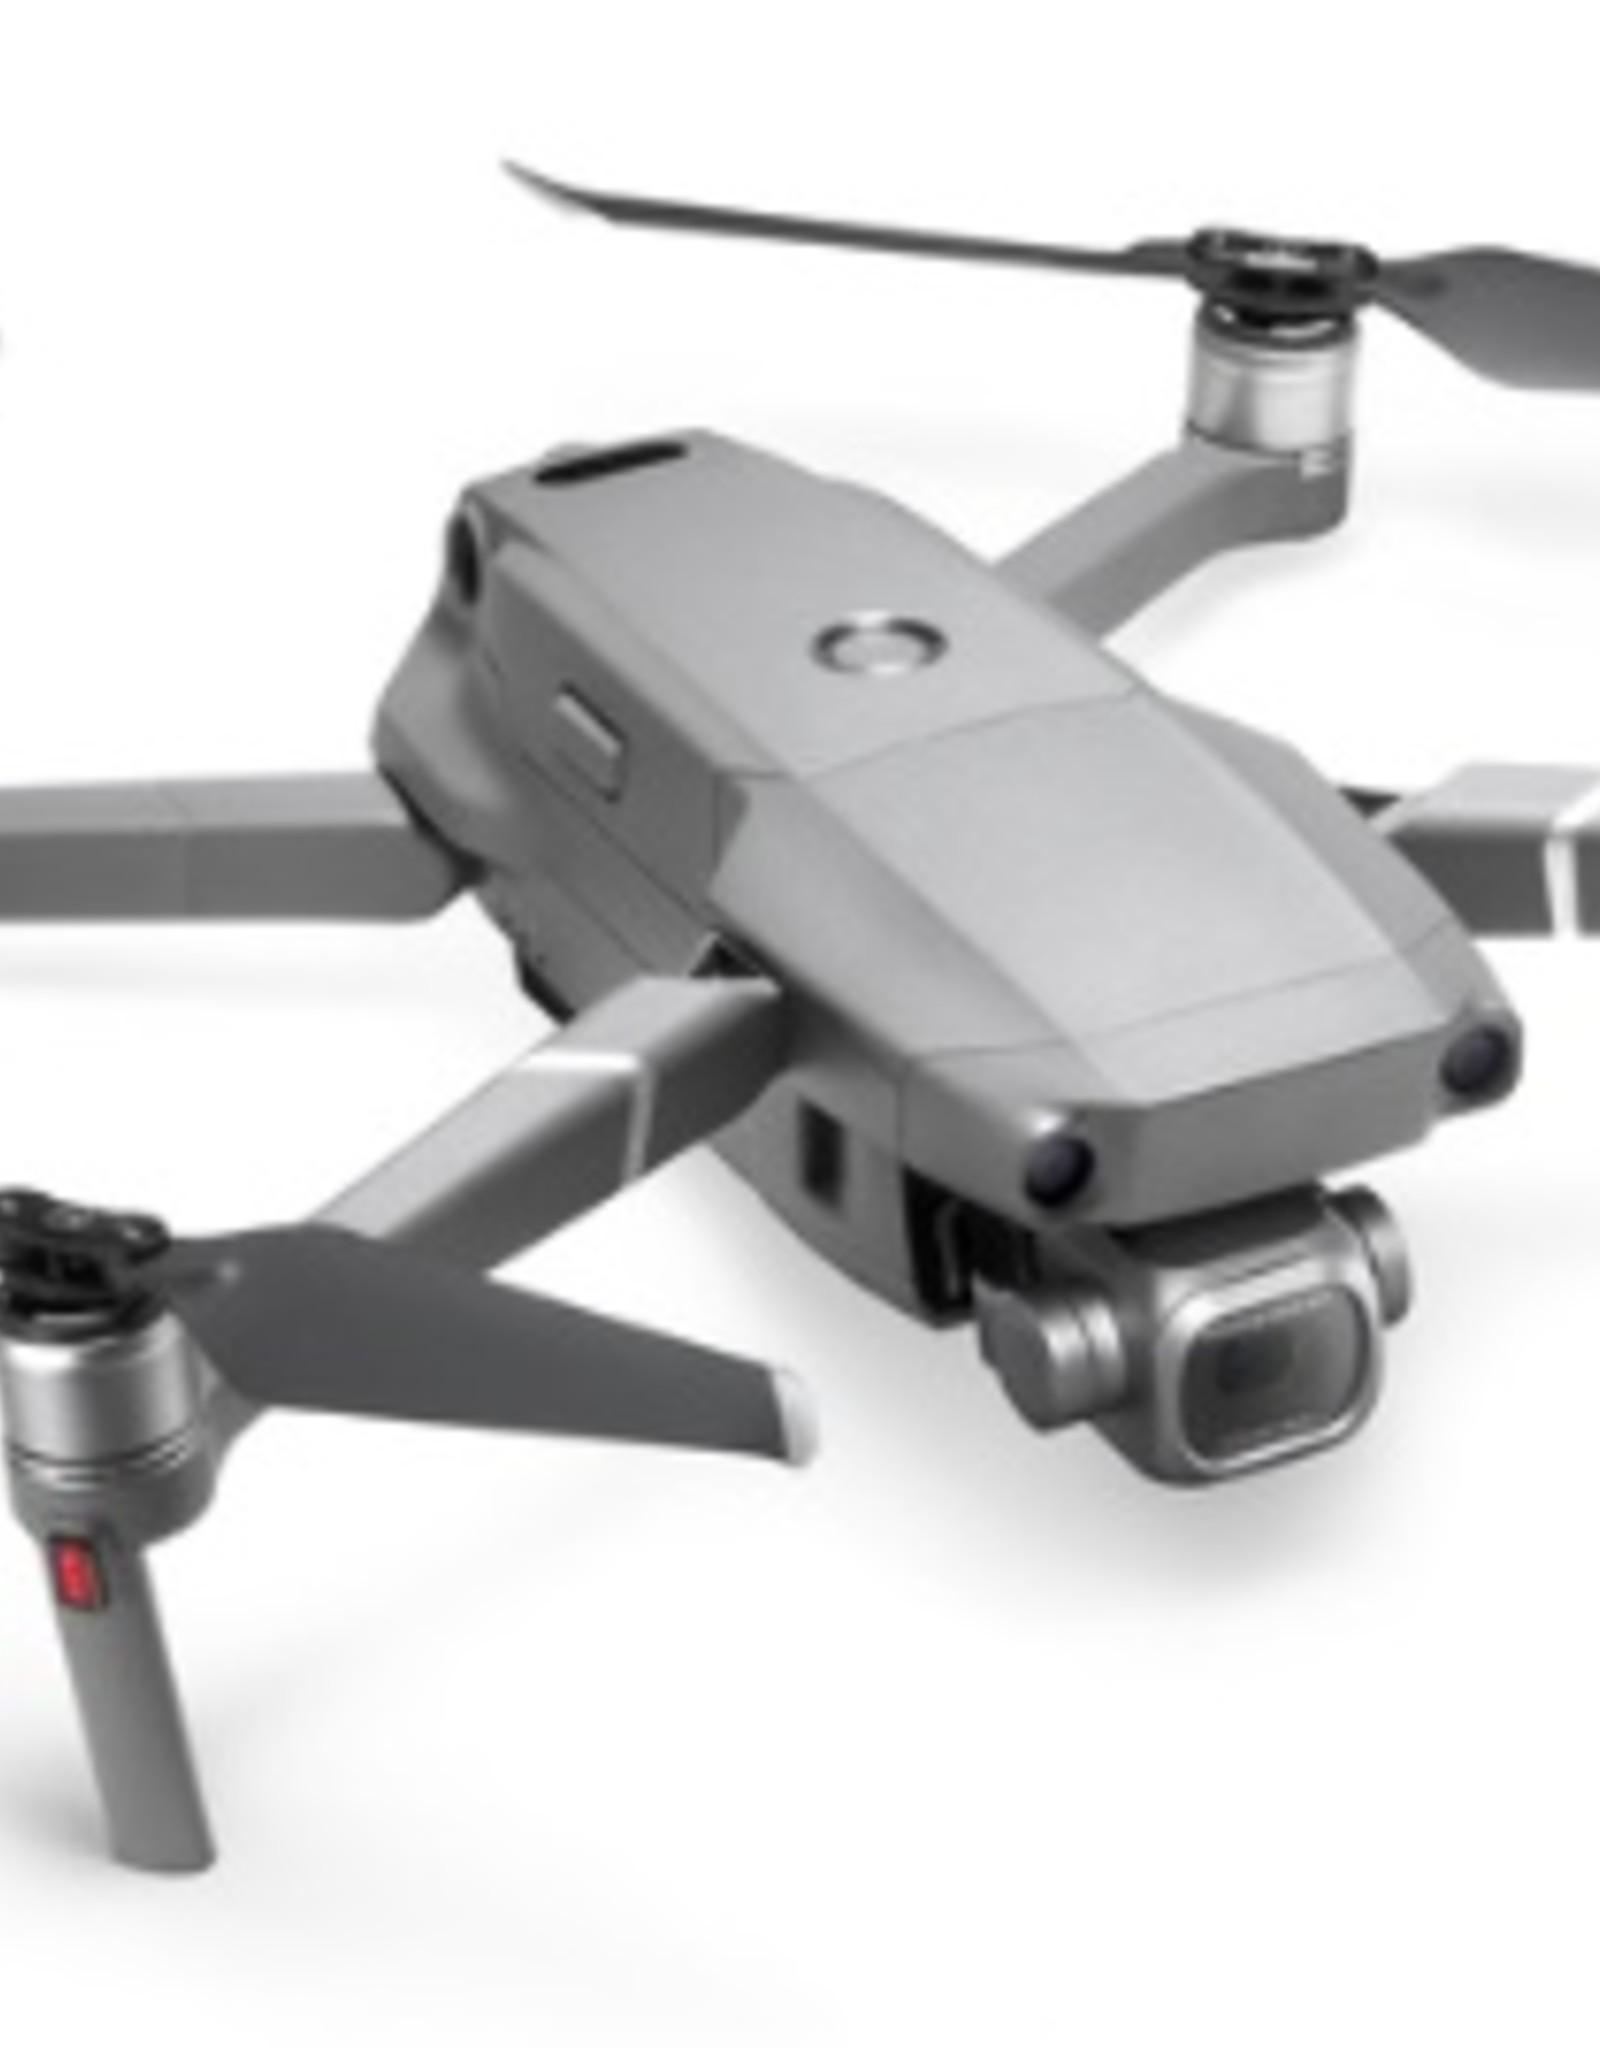 DJI DJI   Mavic 2 Pro Drone   CP.MA.00000019.01